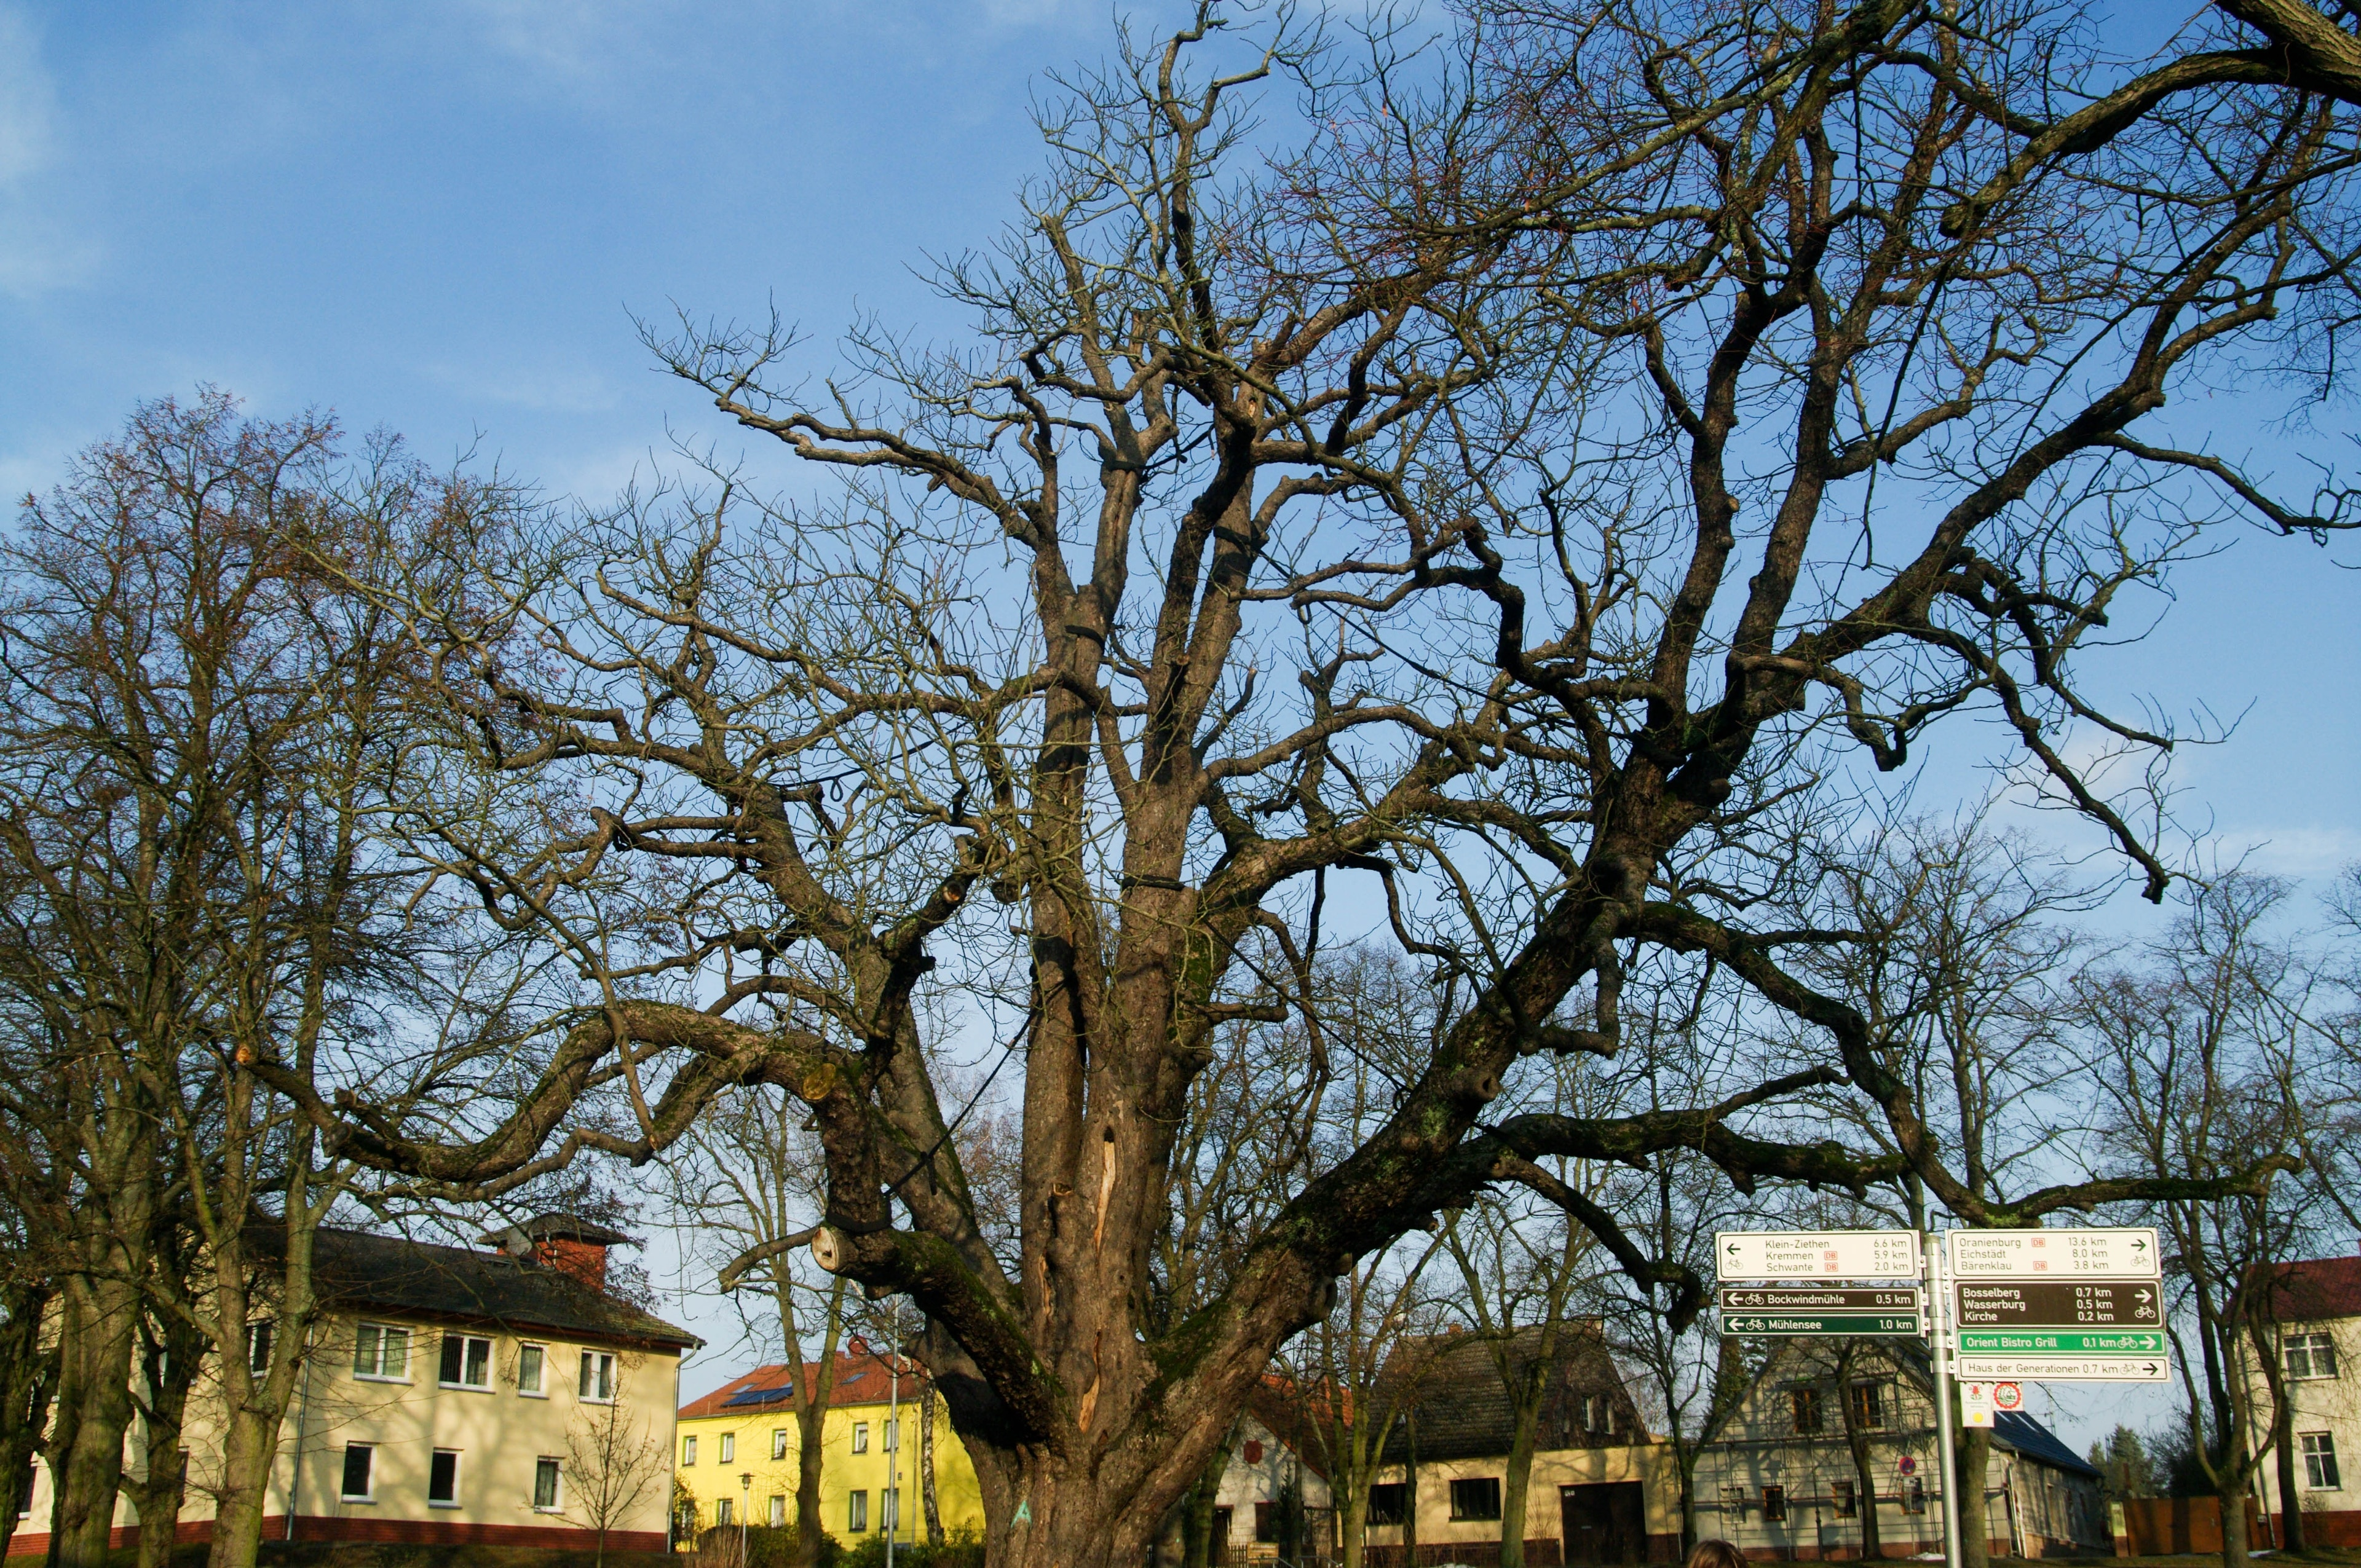 Oberkraemer, Brandenburg Region, Germany